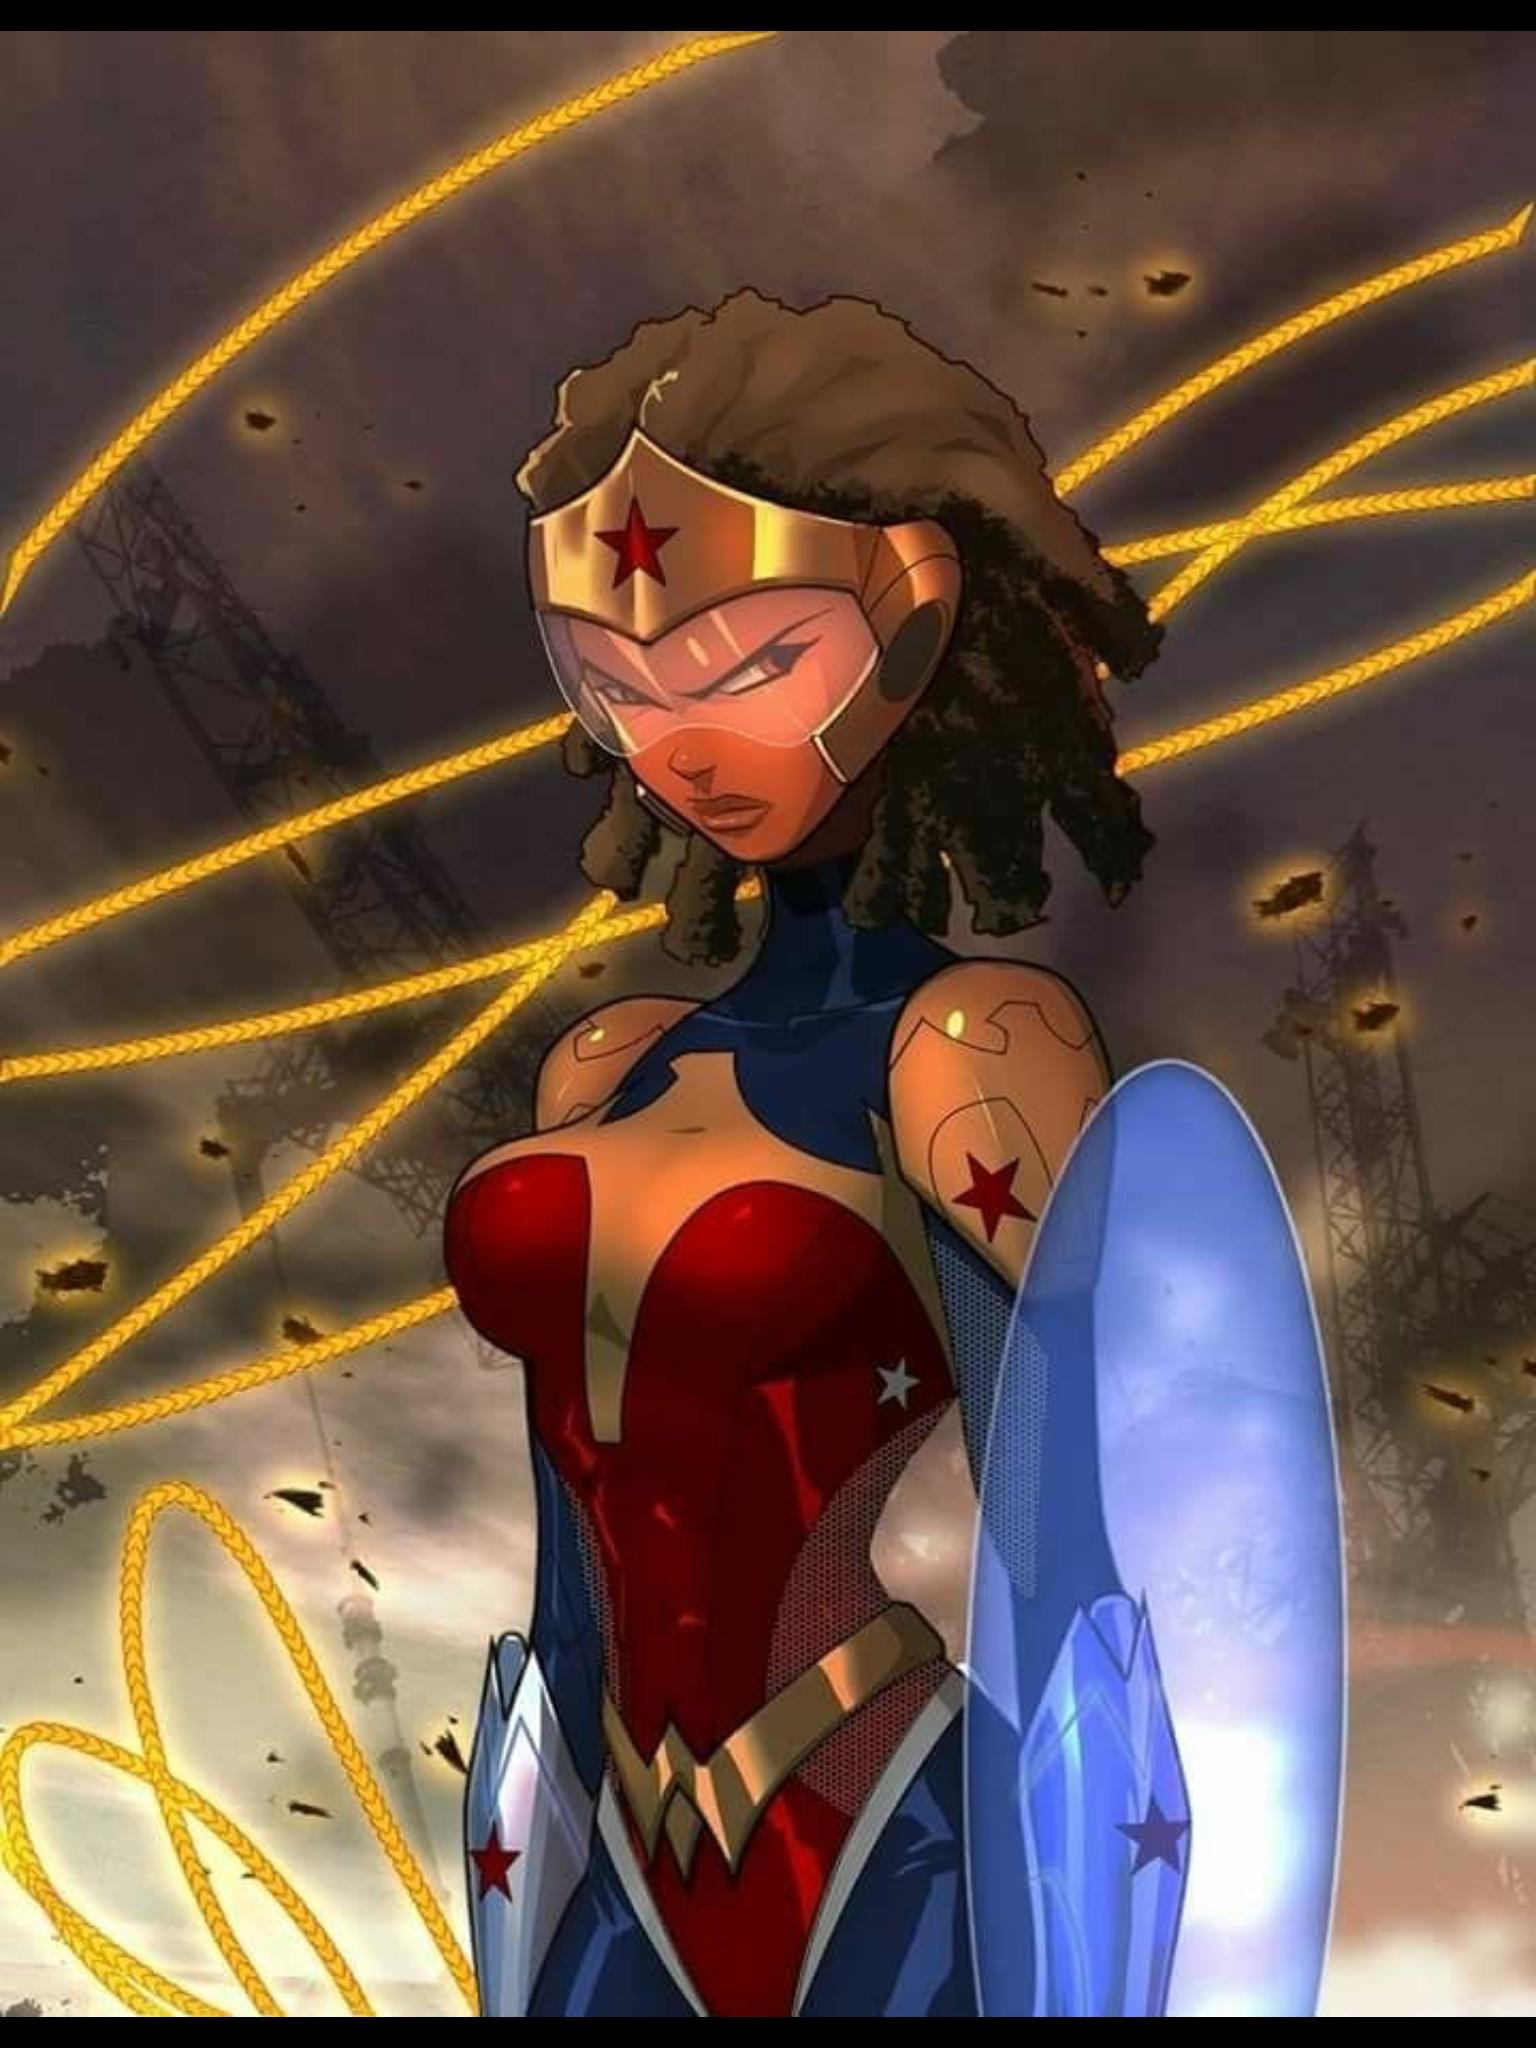 Wonder Woman Wonder Woman Art Superhero Art Black Love Art